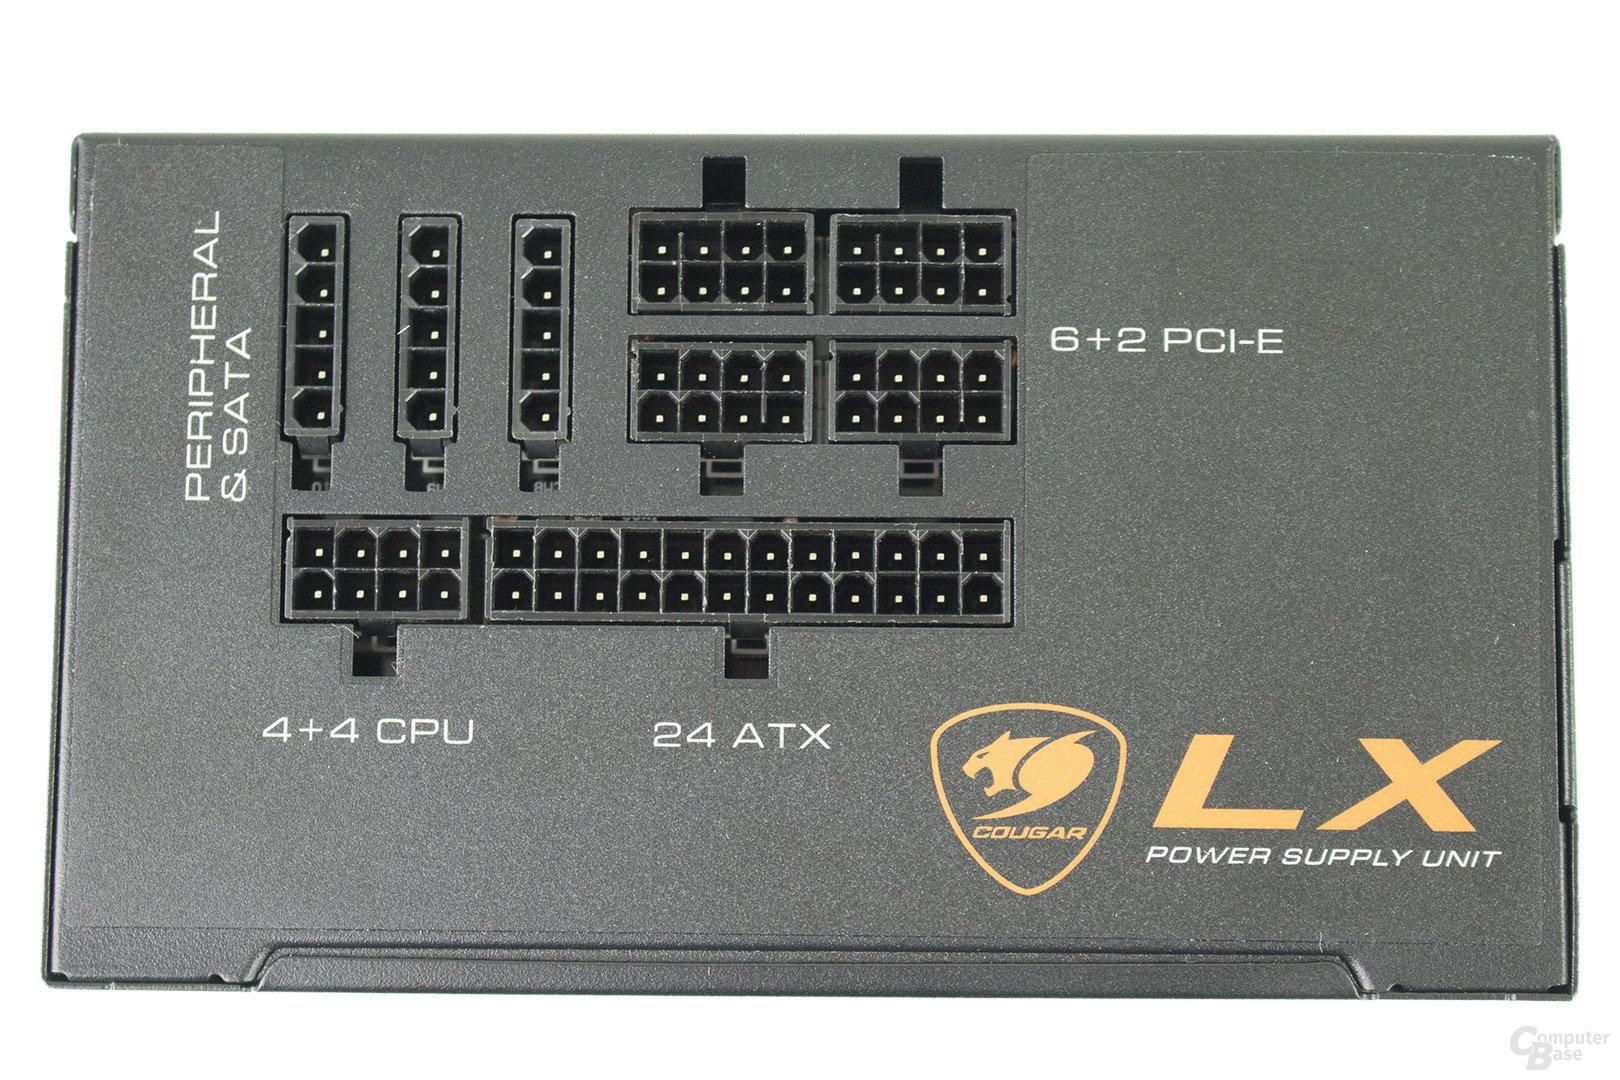 Cougar LX 500